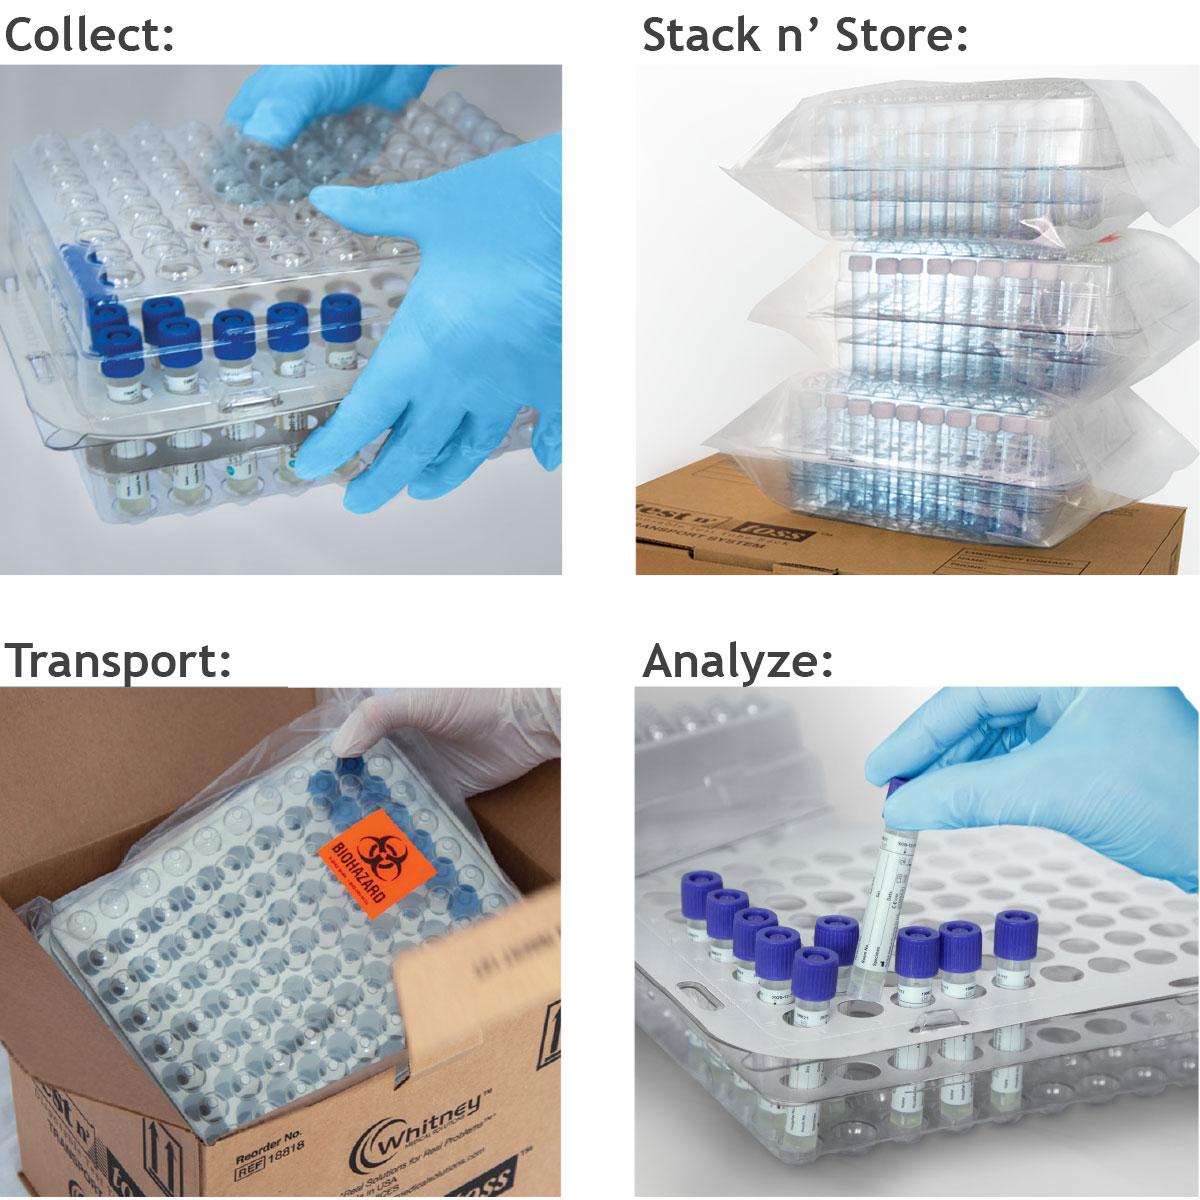 Test Tube Rack Specimen Collect Stack Transport Analyze